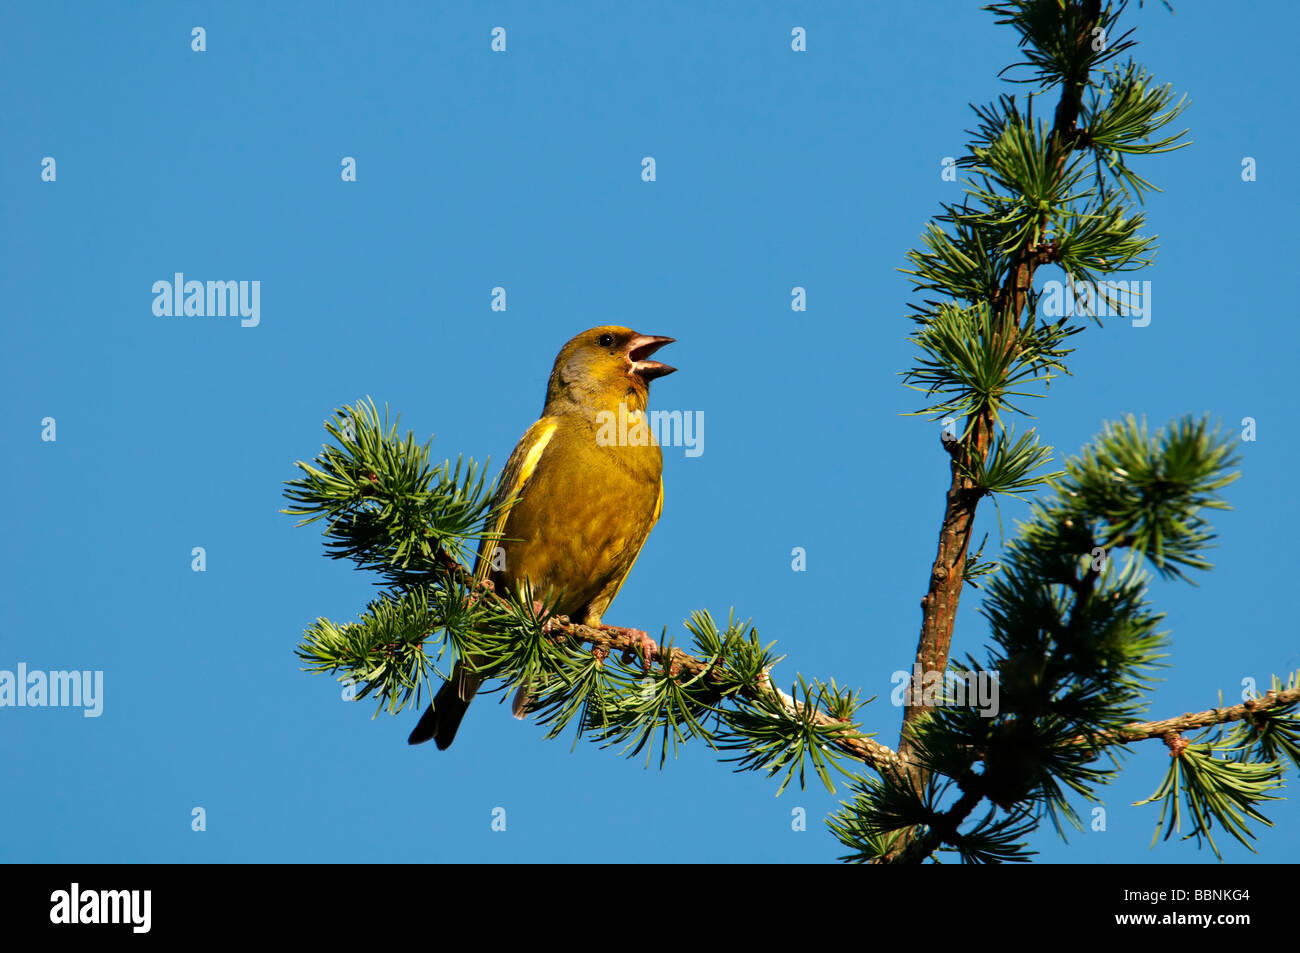 European greenfinch (Carduelis chloris) Stock Photo